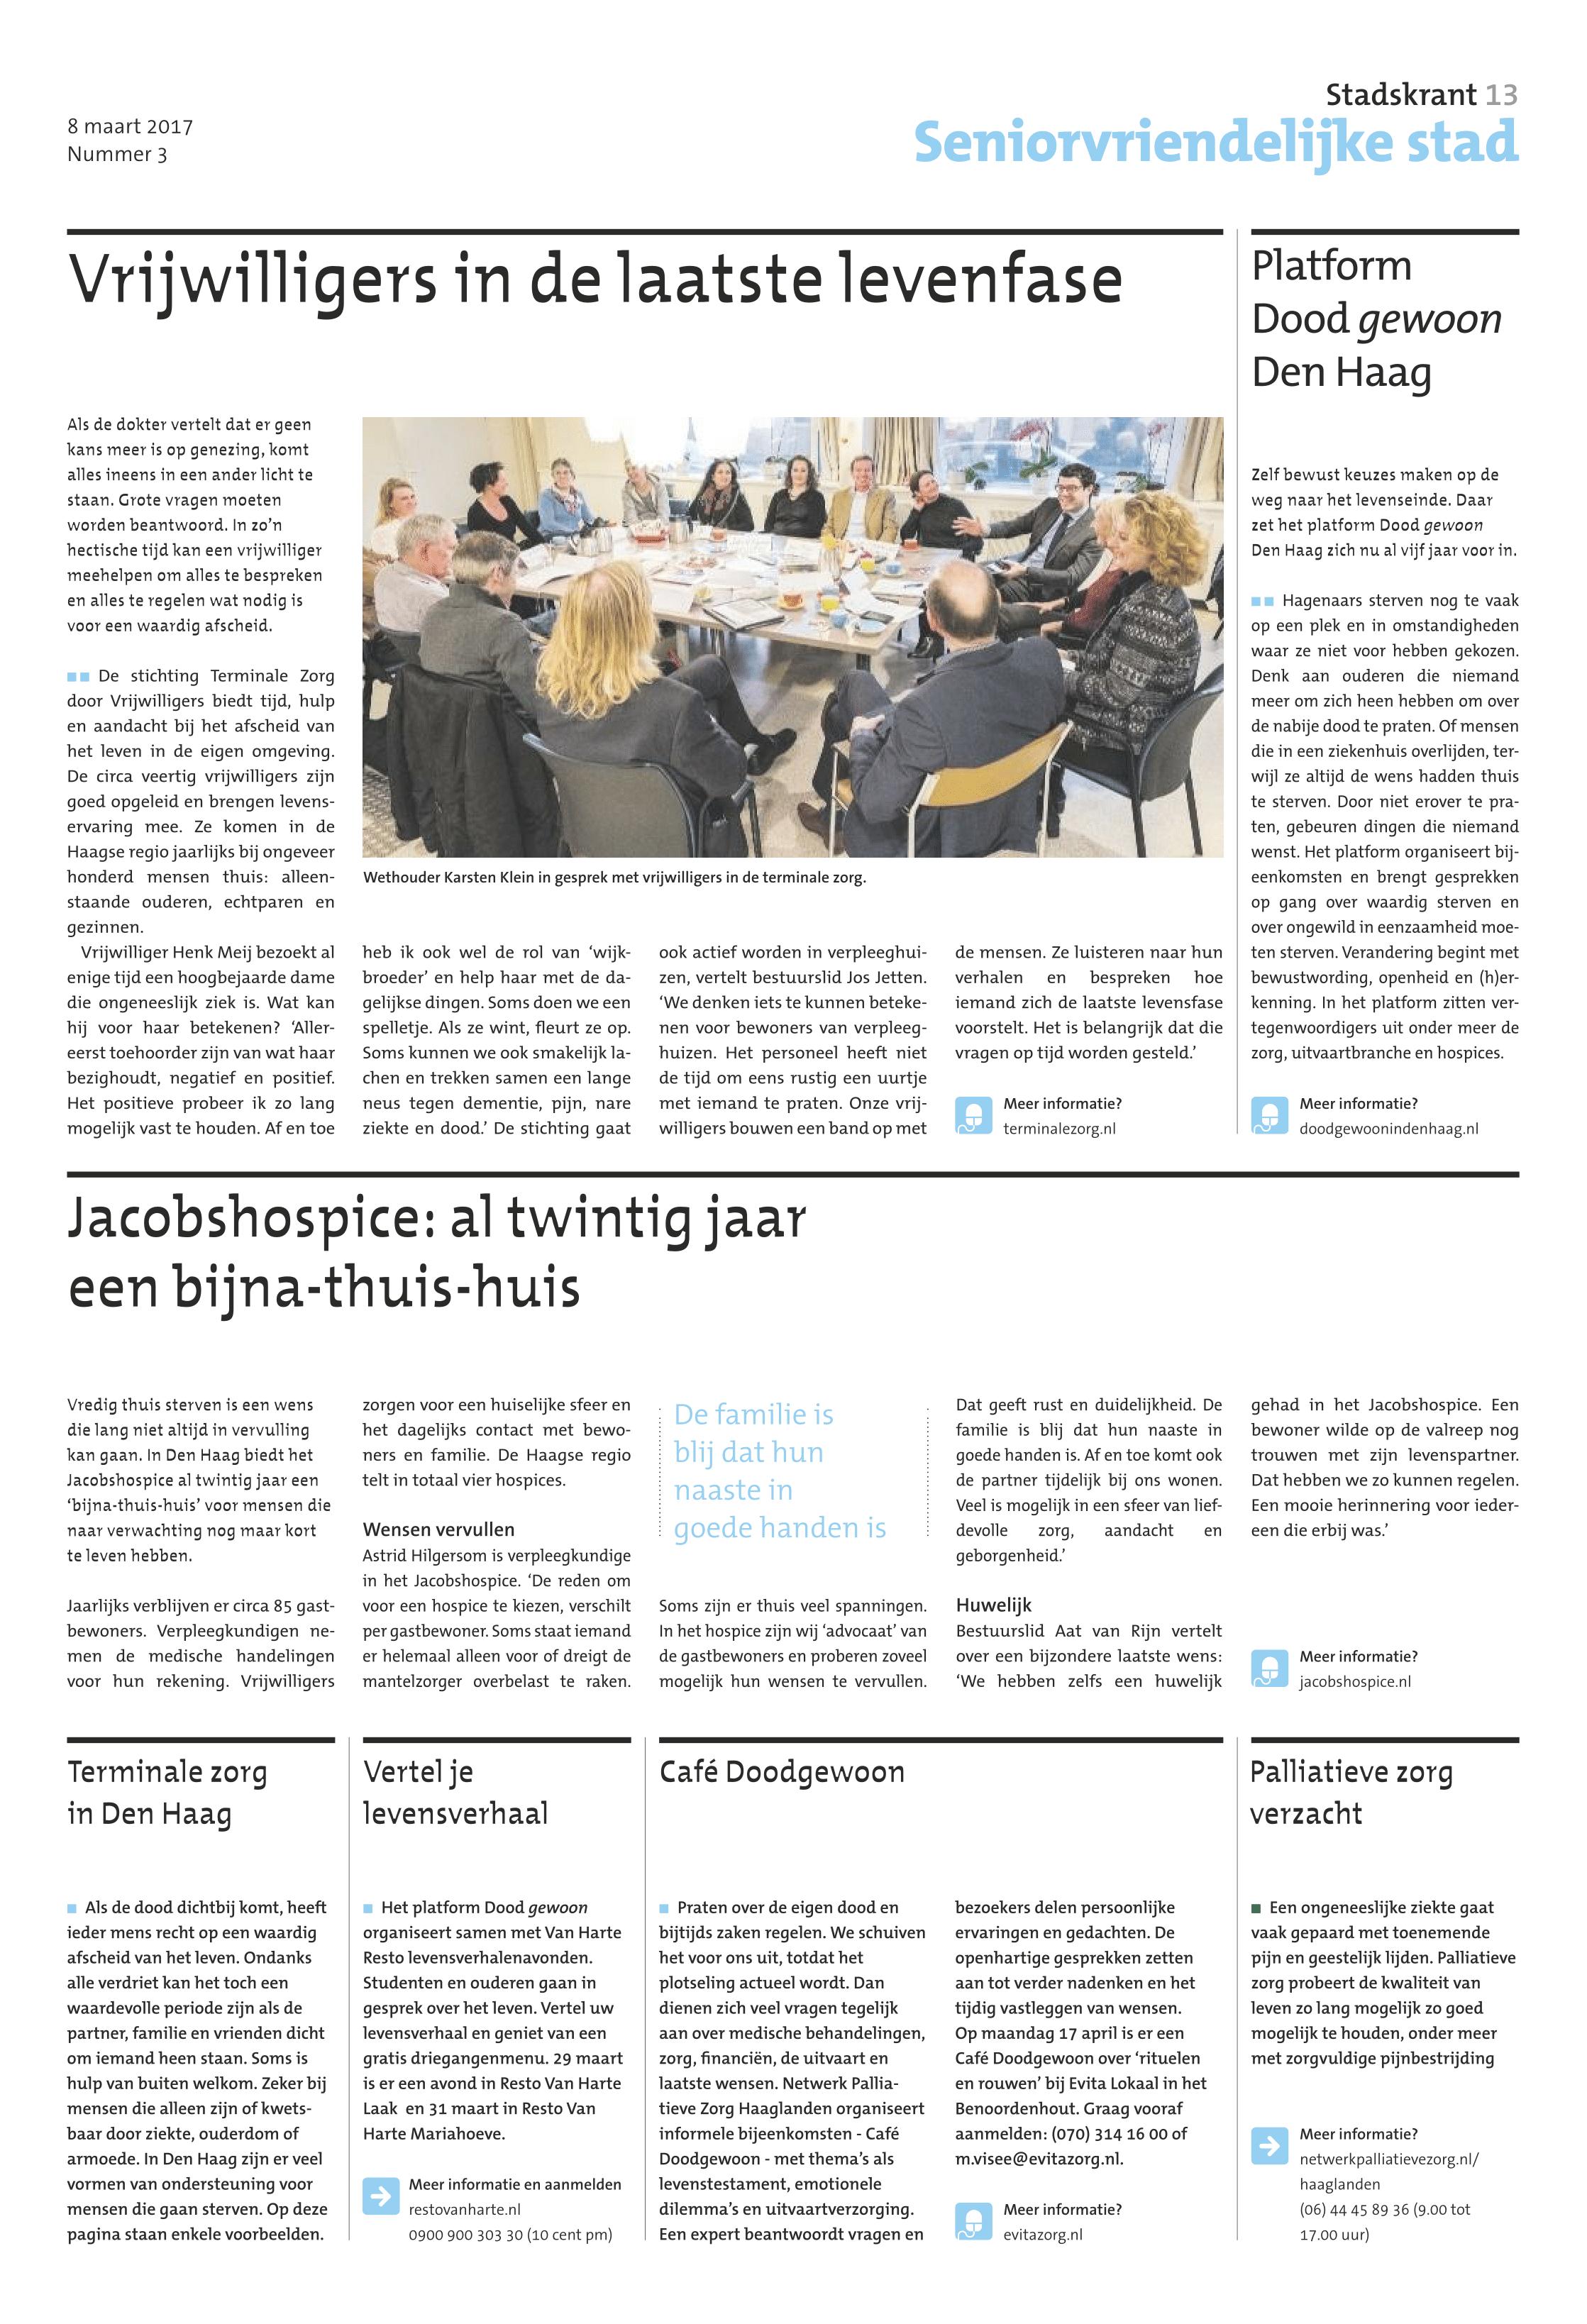 Stadskrant 8 maart 2017